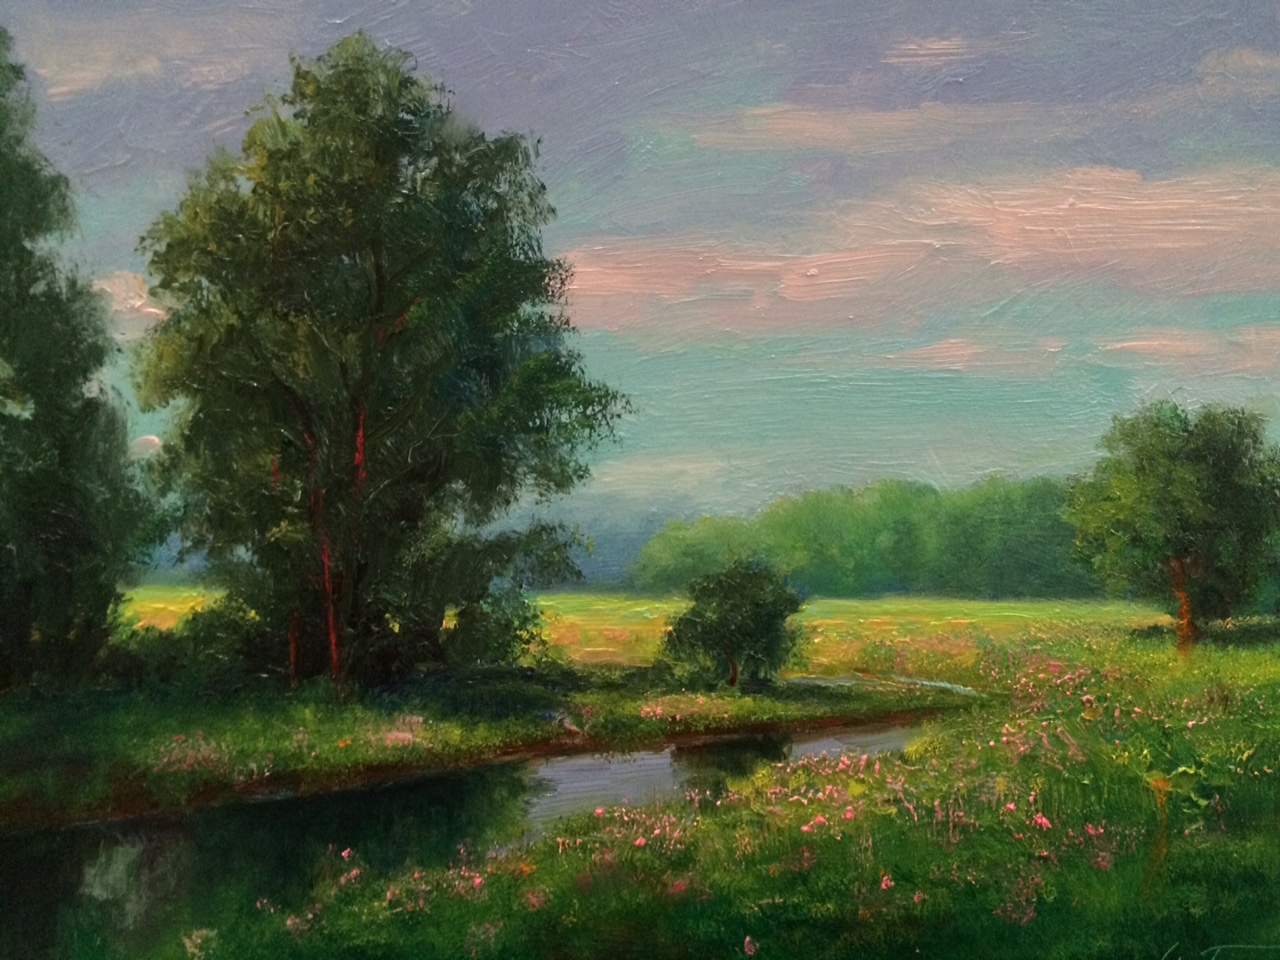 Saturday morning Landscape Art Work